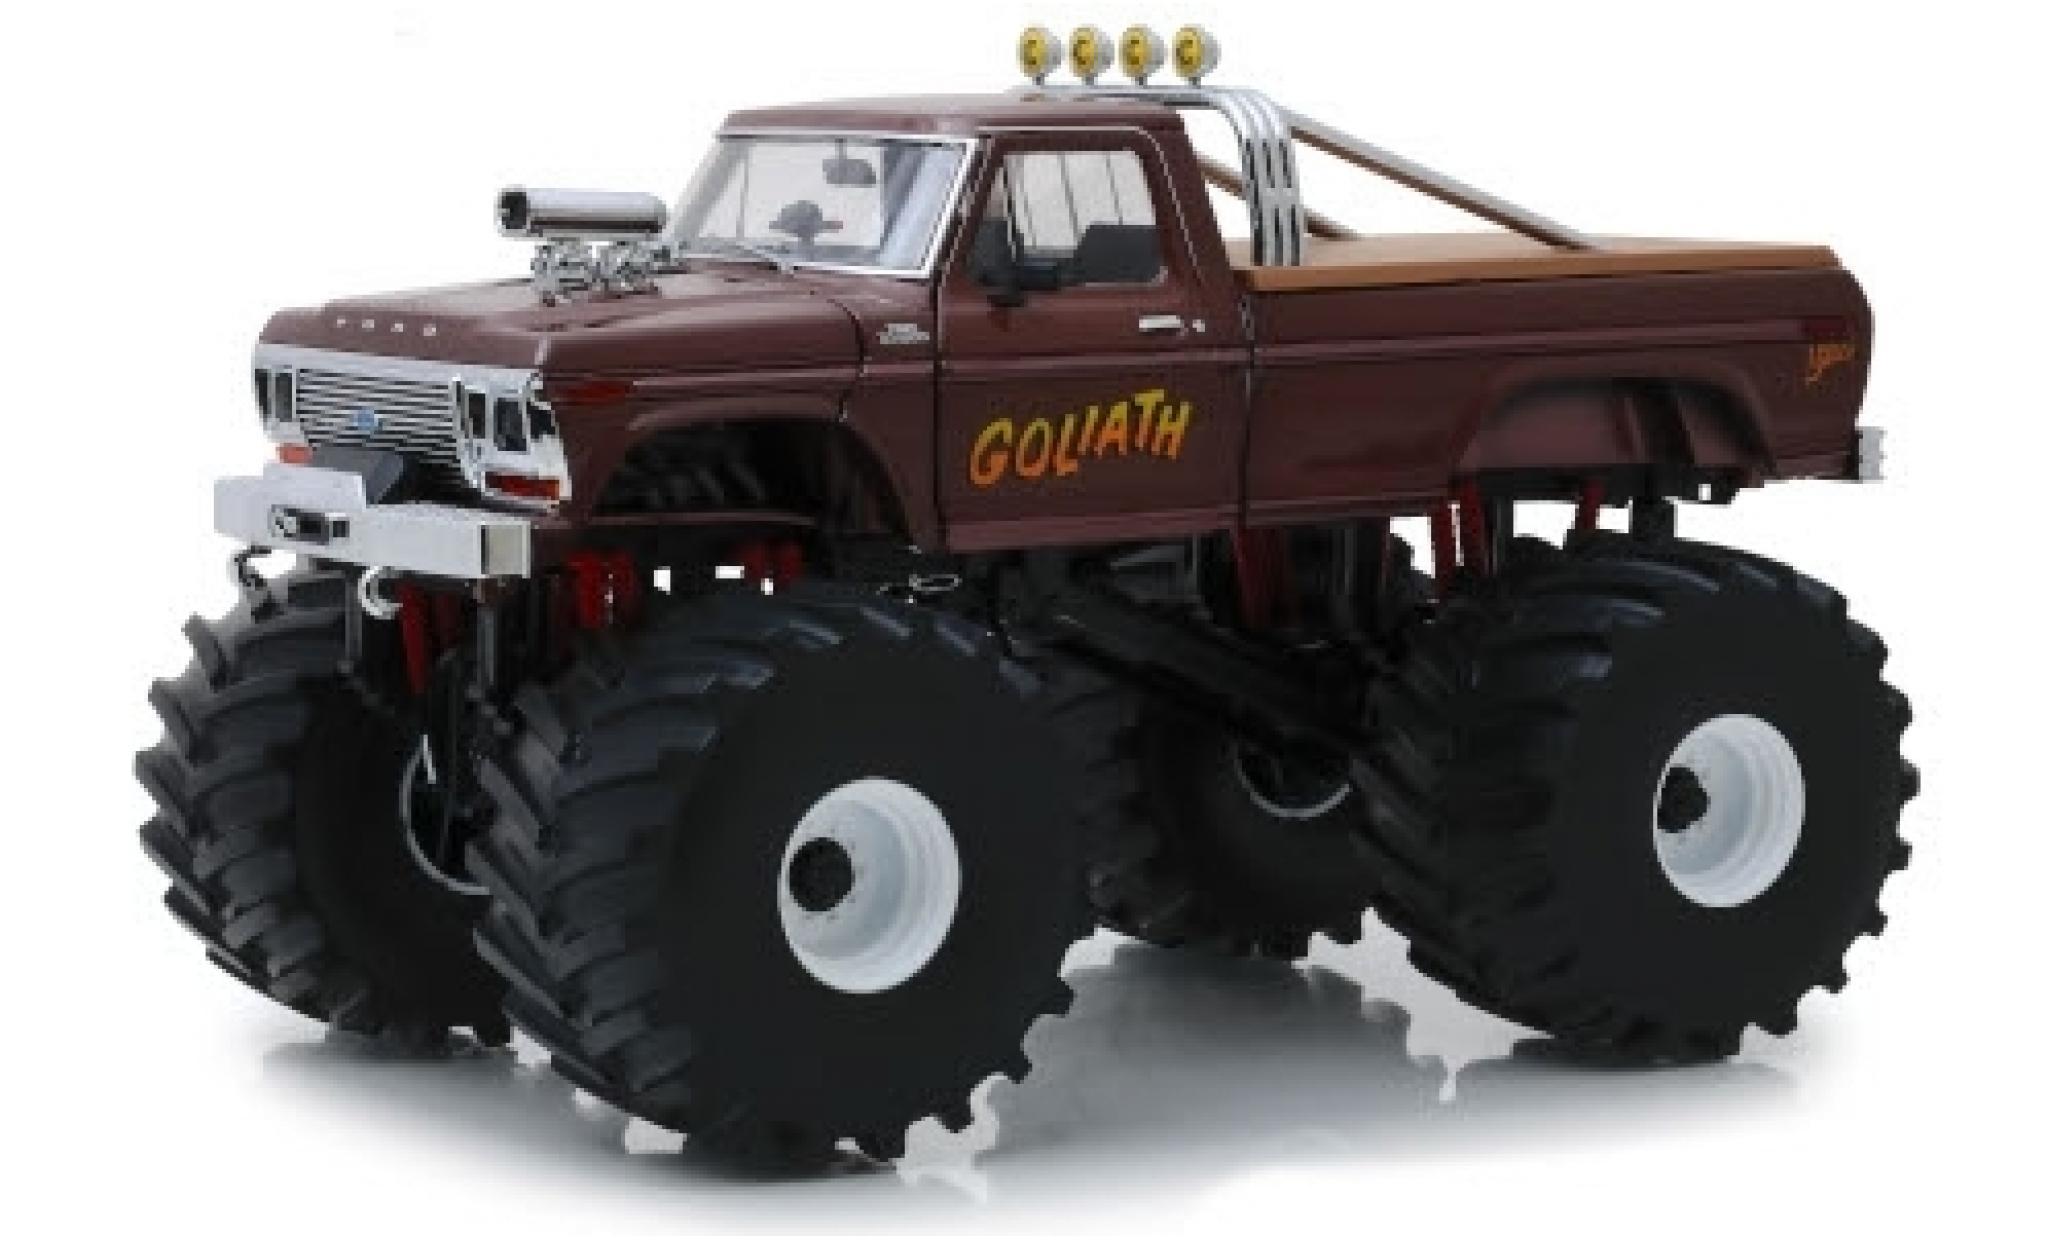 Ford F-250 1/43 Greenlight Monster Truck Goliath 1979